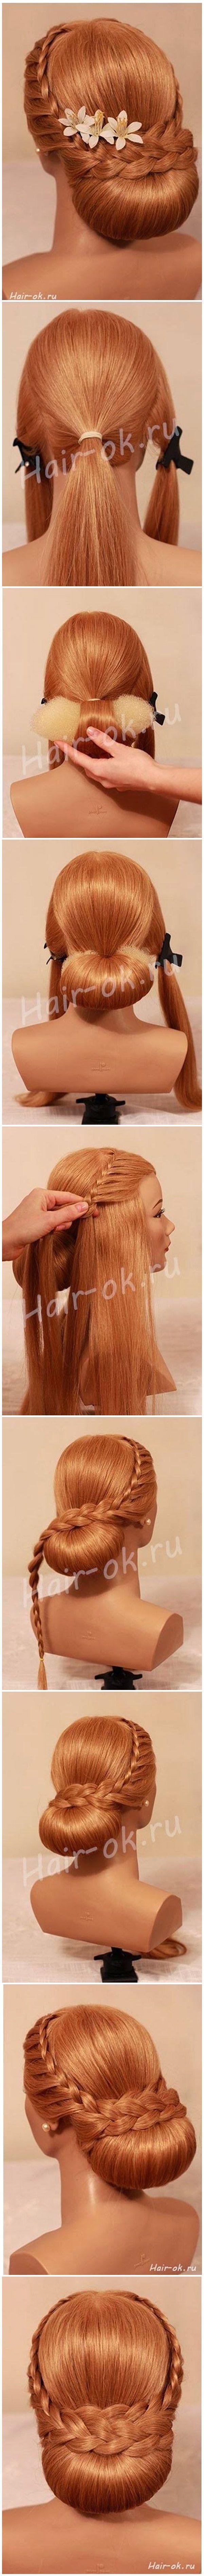 Diy elegant evening braid hairstyle hairstyle pinterest braid